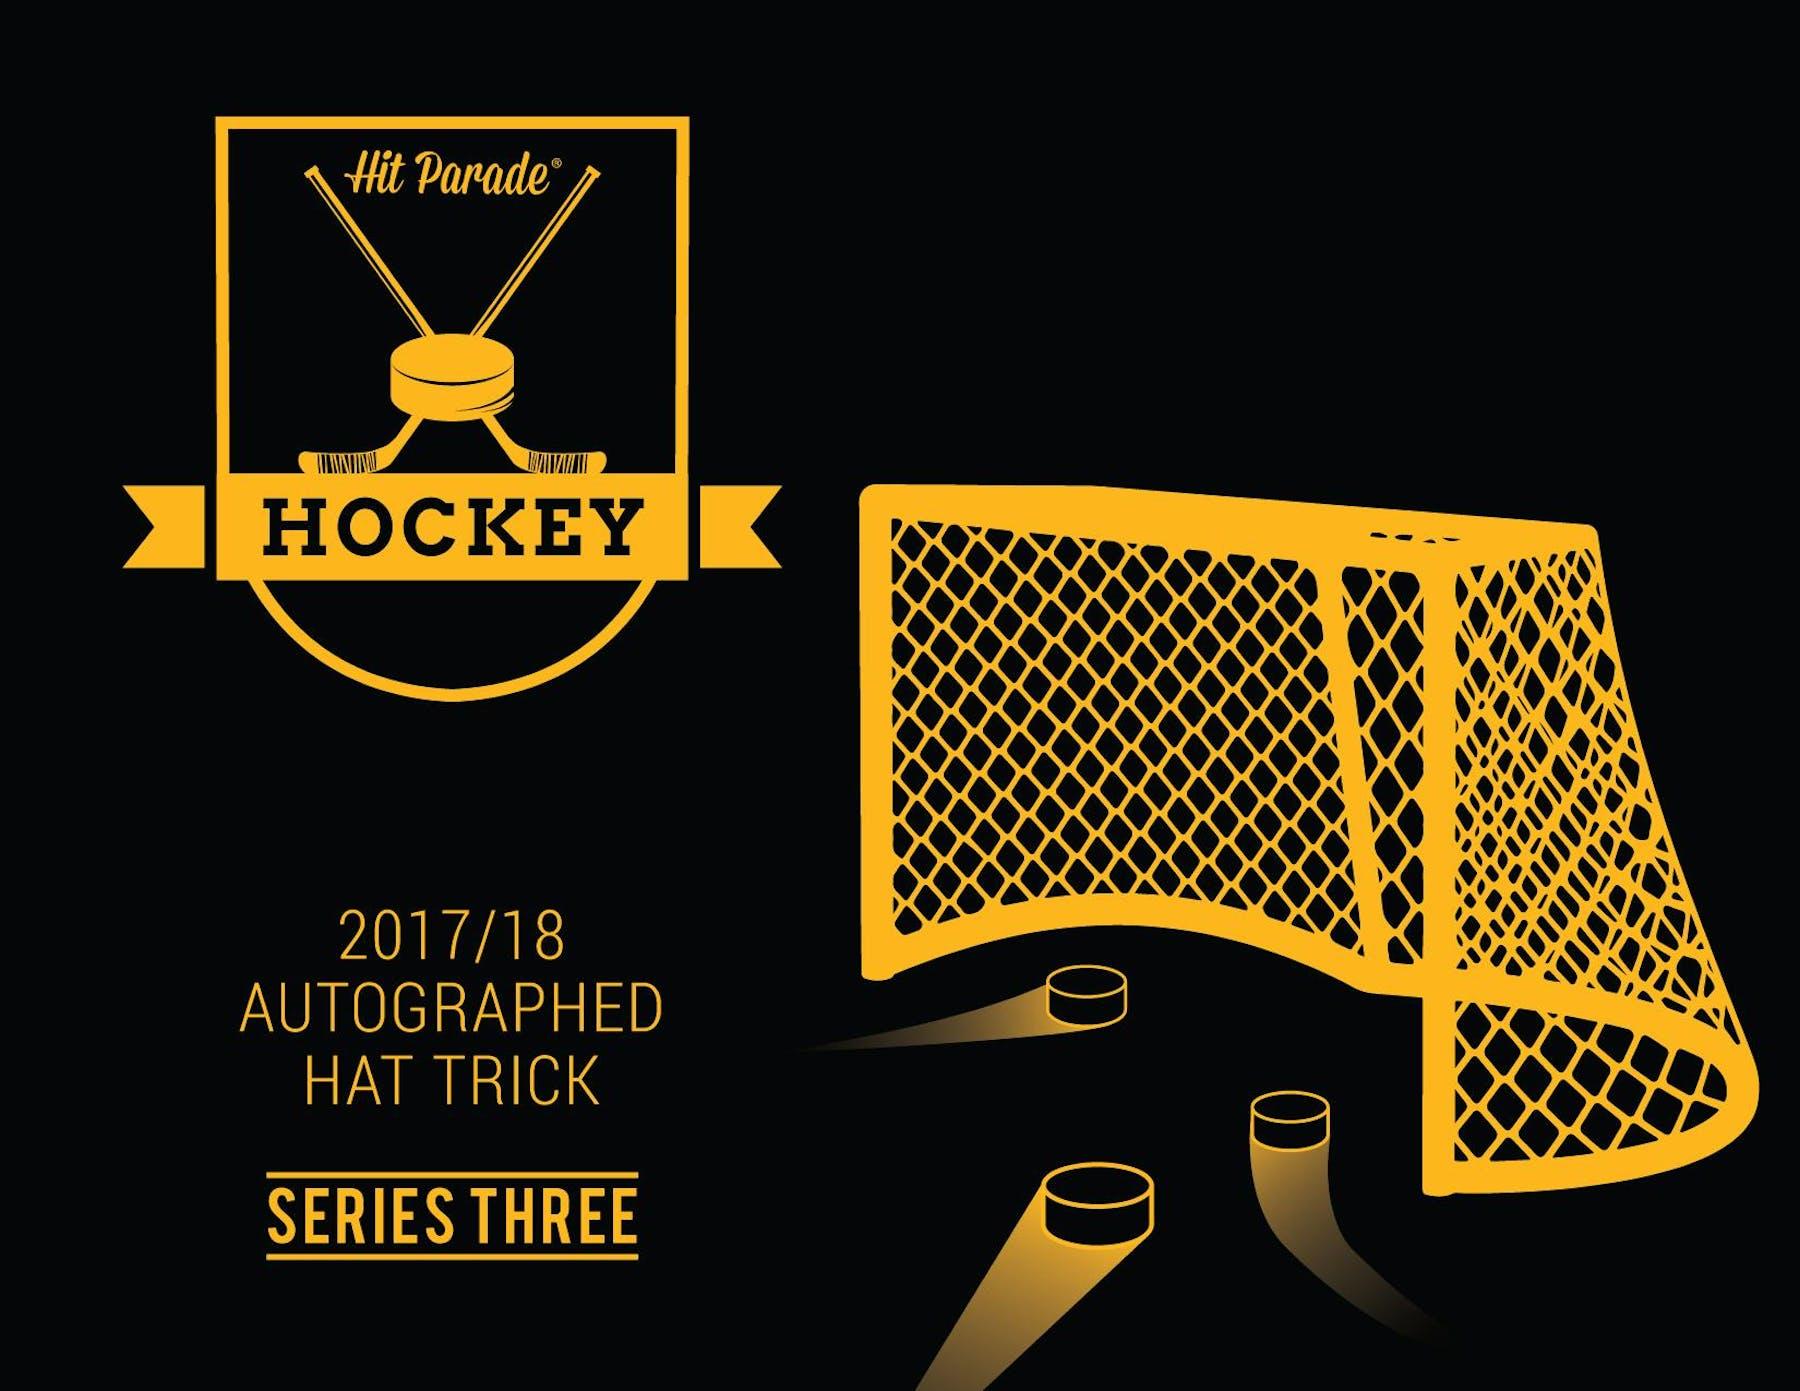 17decea124d 2017 18 Hit Parade Autographed HAT TRICK Hockey Hobby Box ...